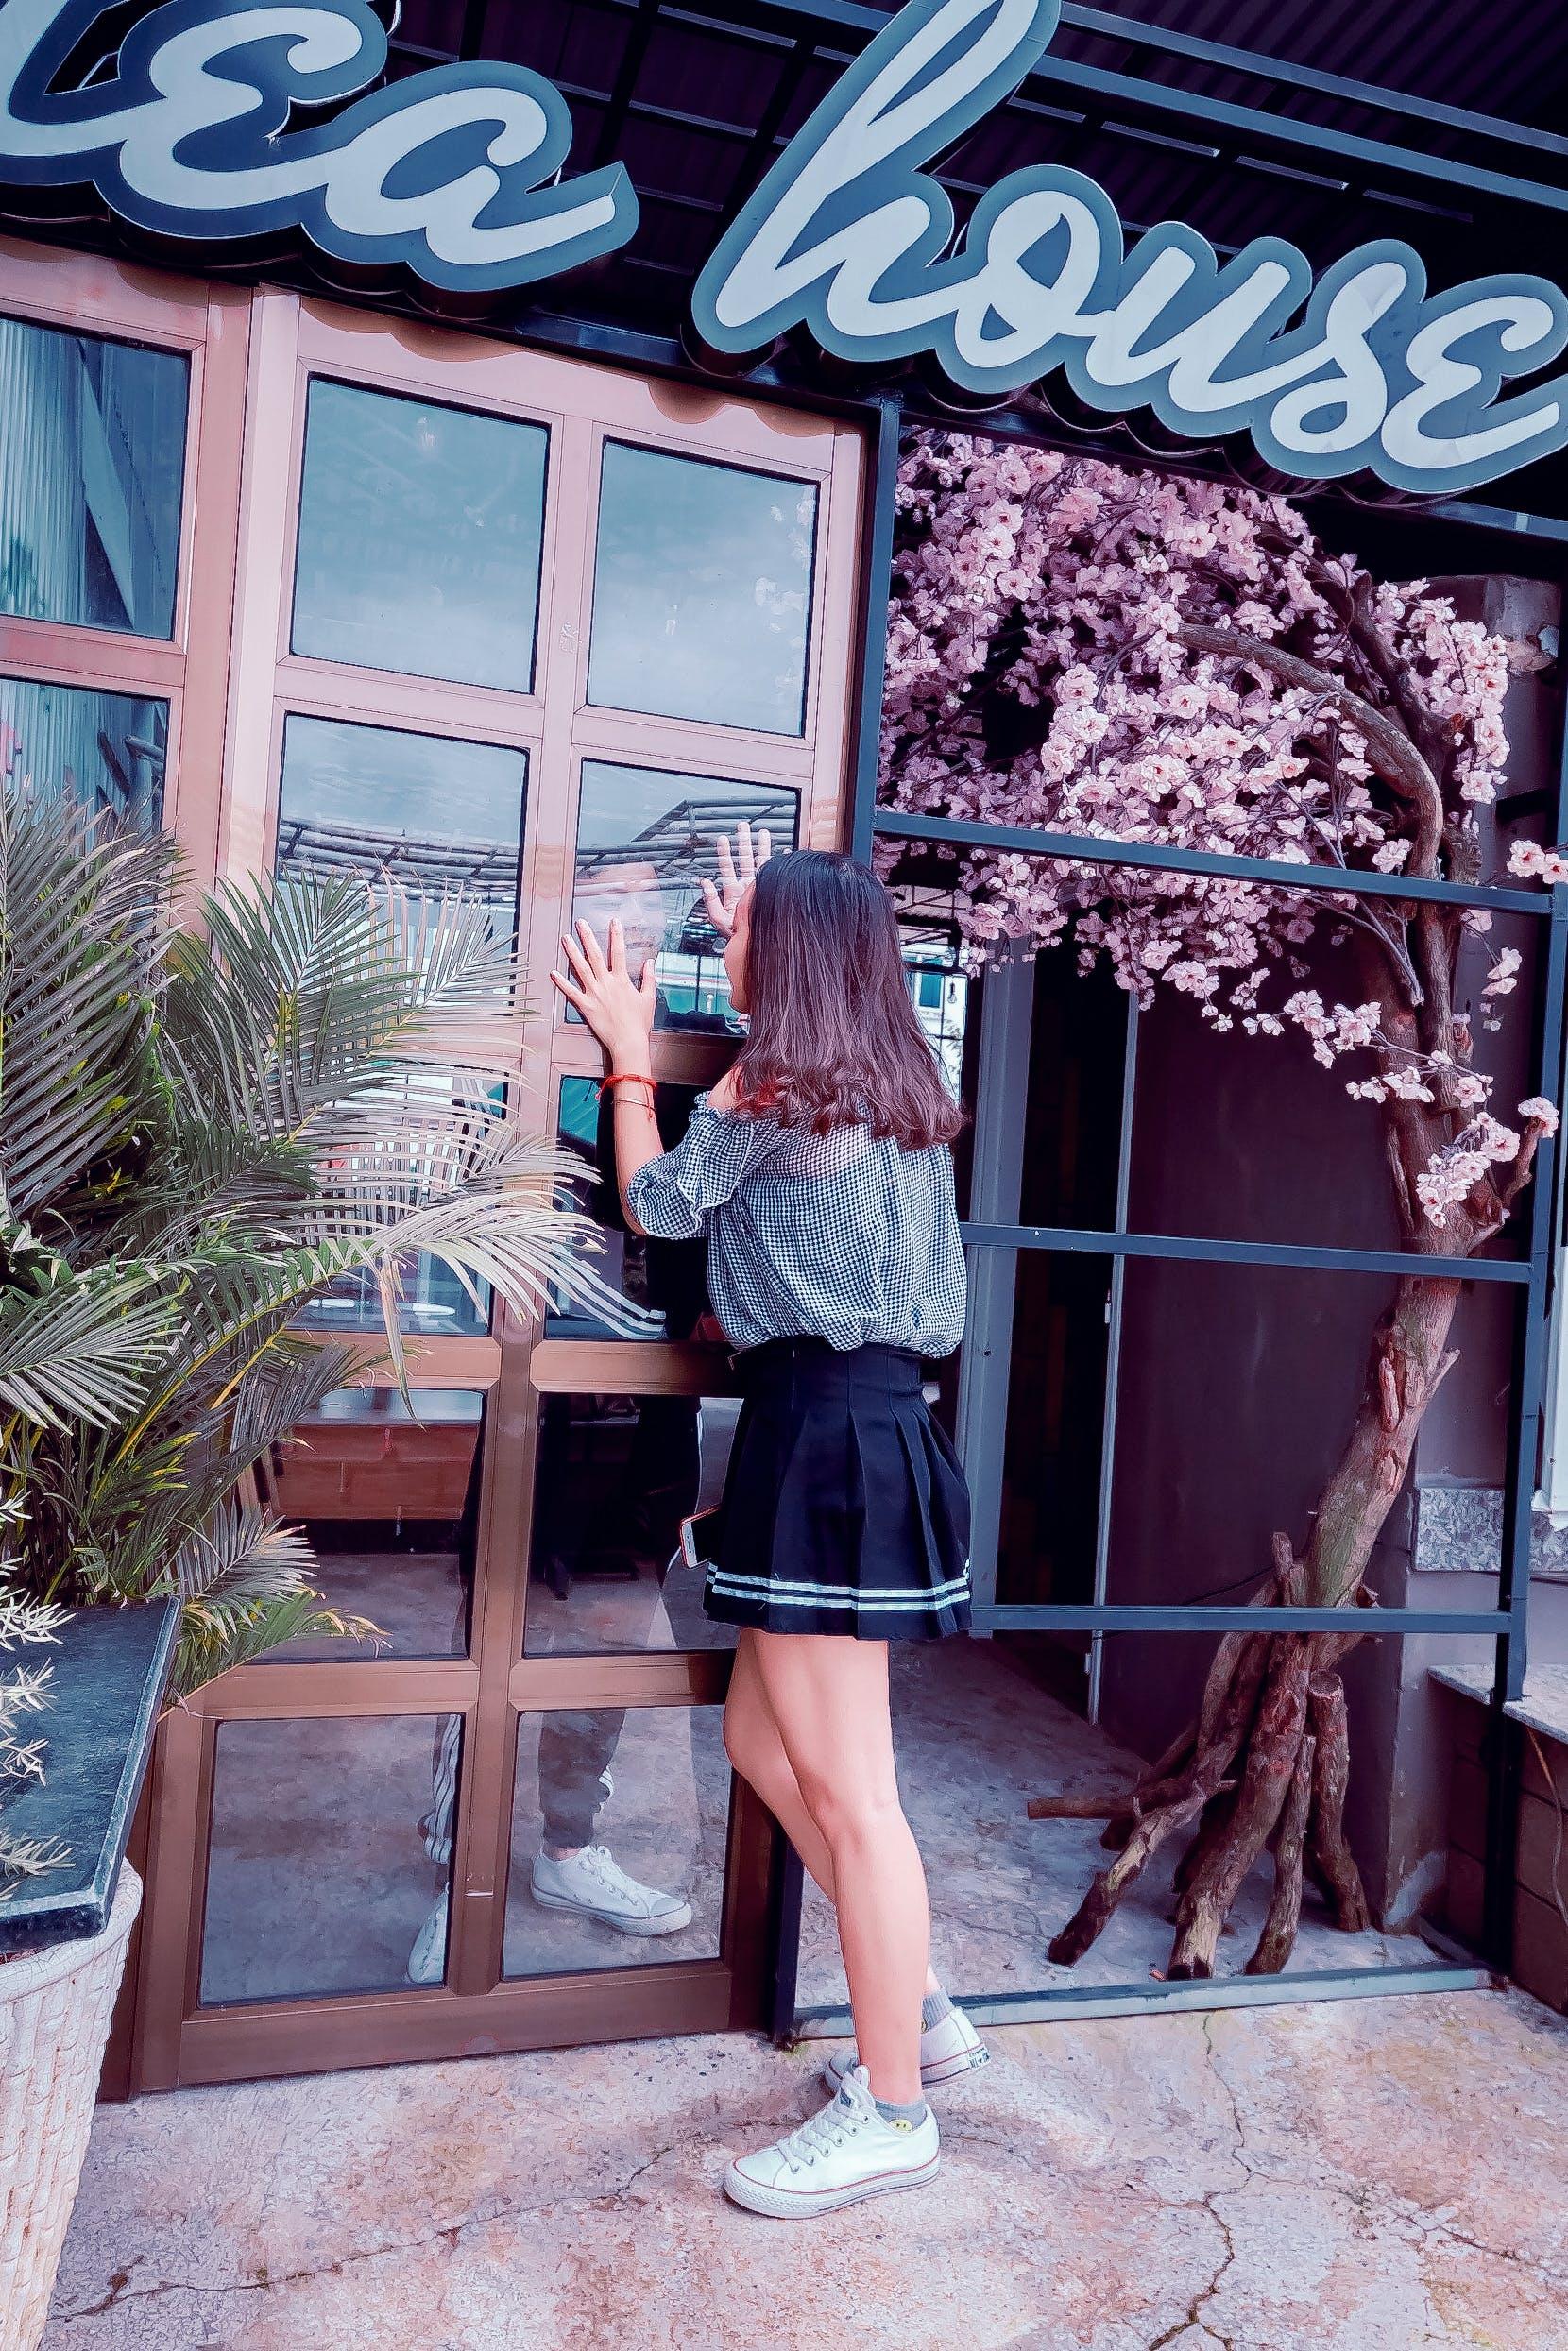 Woman Looking Through a Glass Door